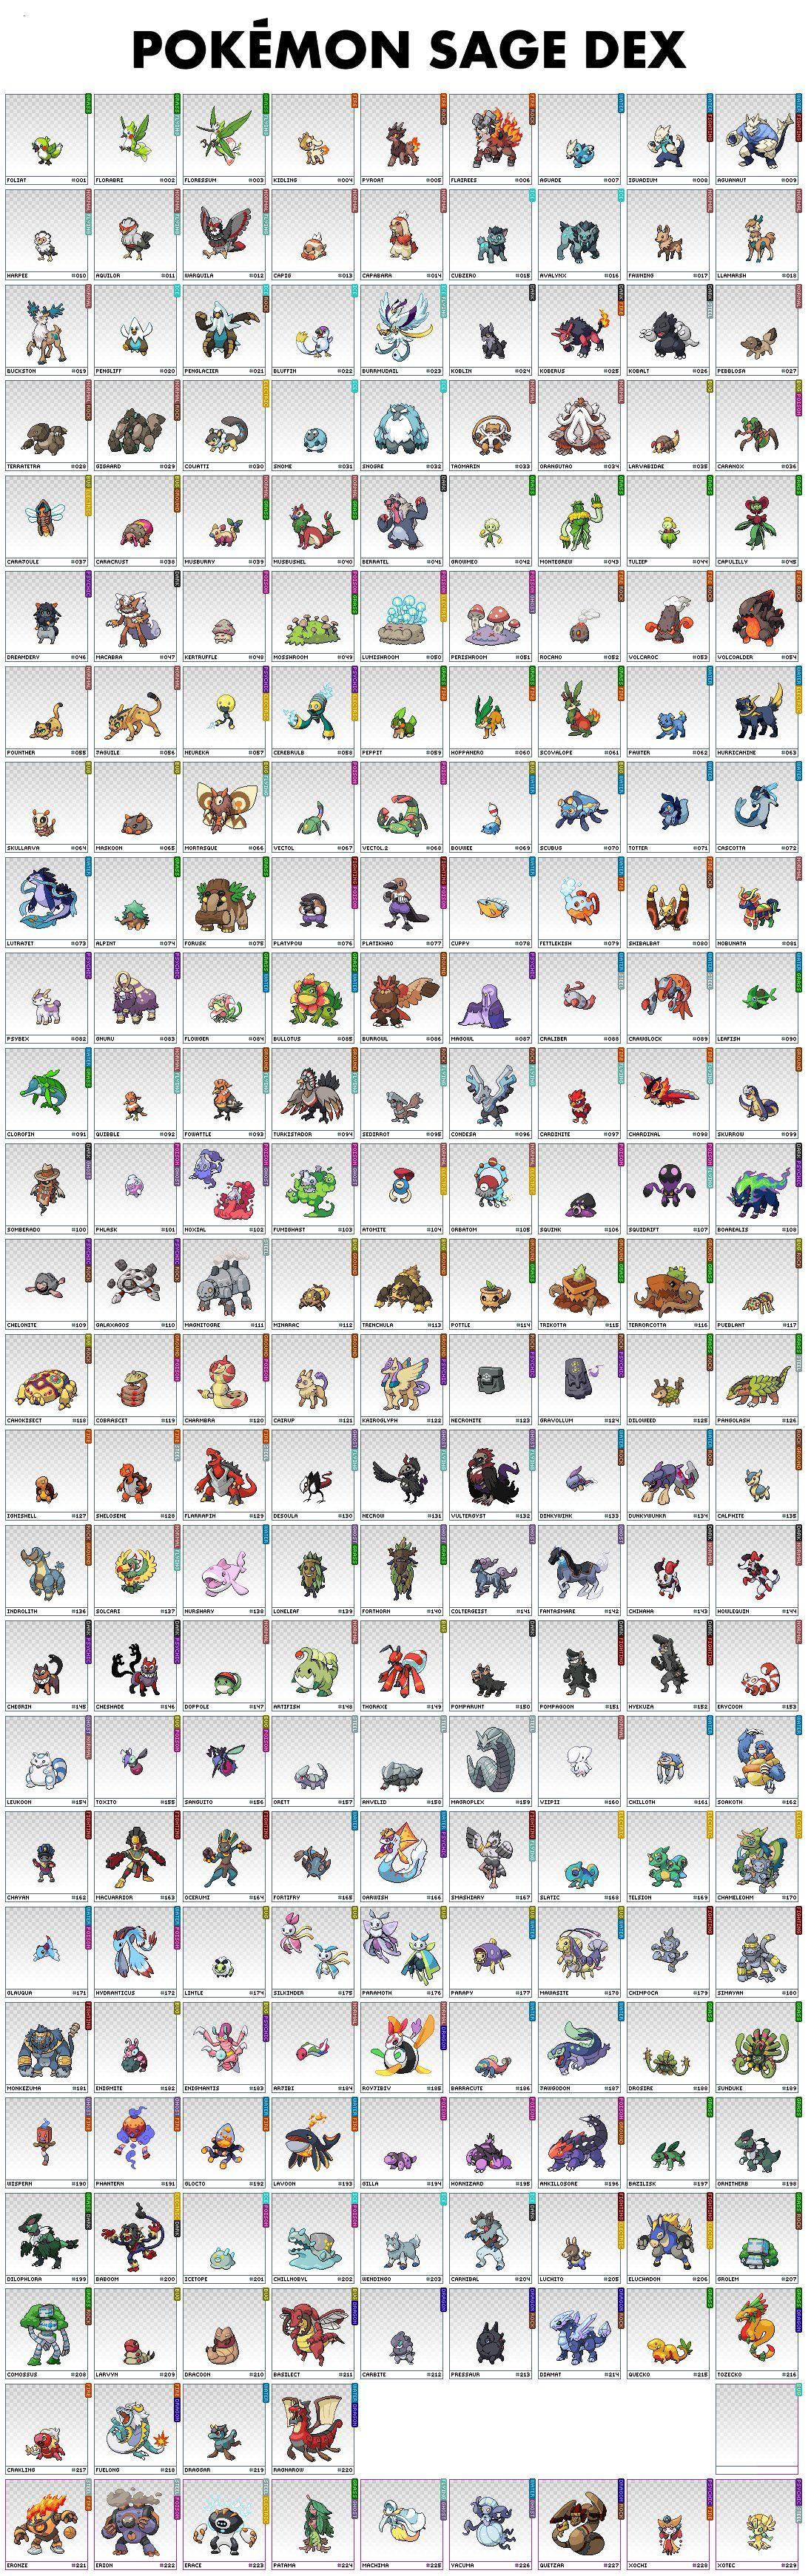 roster for 4chan s pokemon sage gotta catch em all pokémon